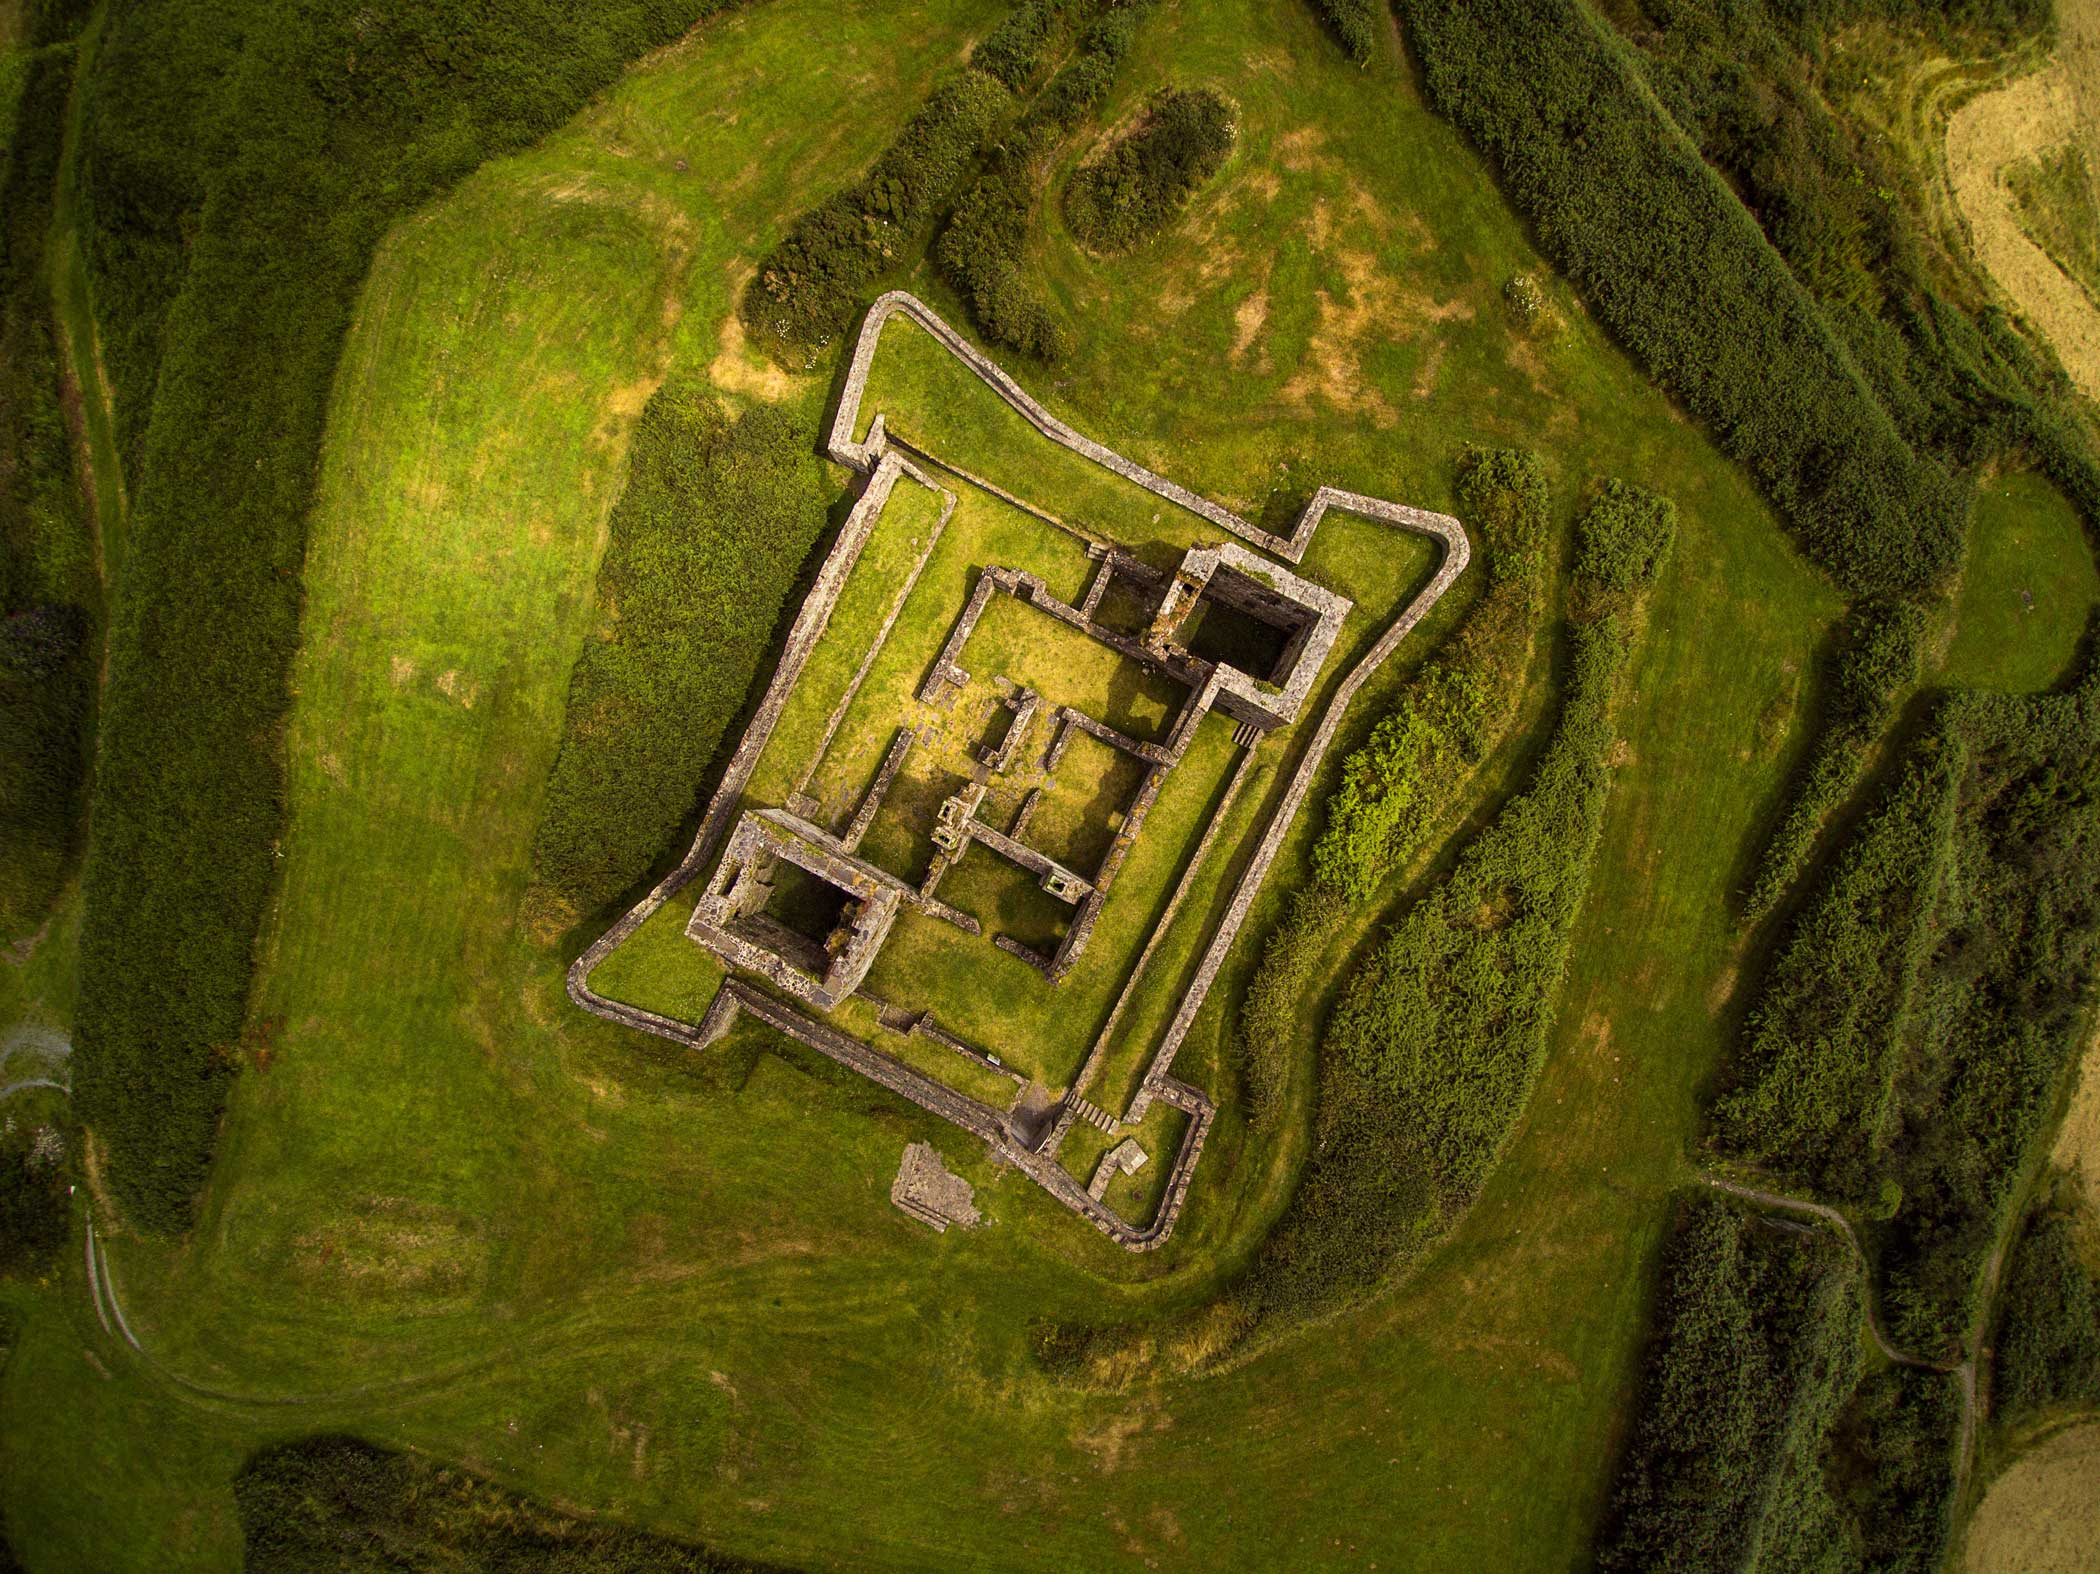 James Fort in Castlepark Village, Ireland.